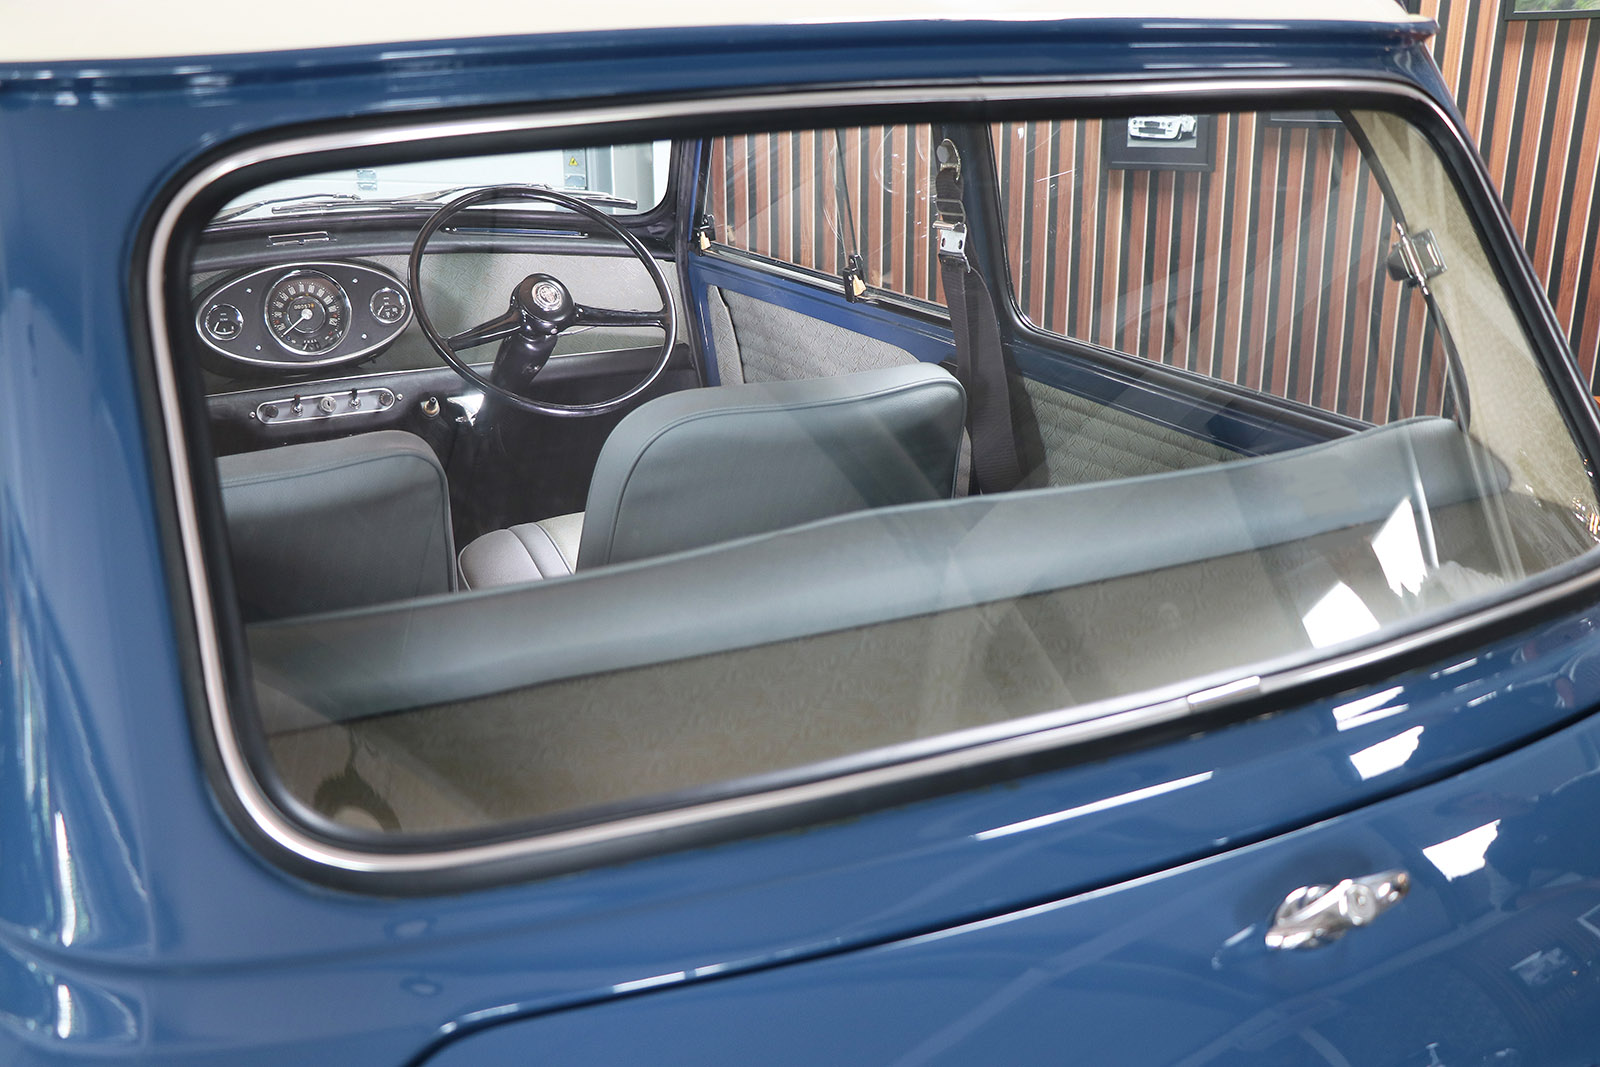 1967 blue 1275 Mini Cooper S Sayer Selection Wilkinson 30 web.jpg